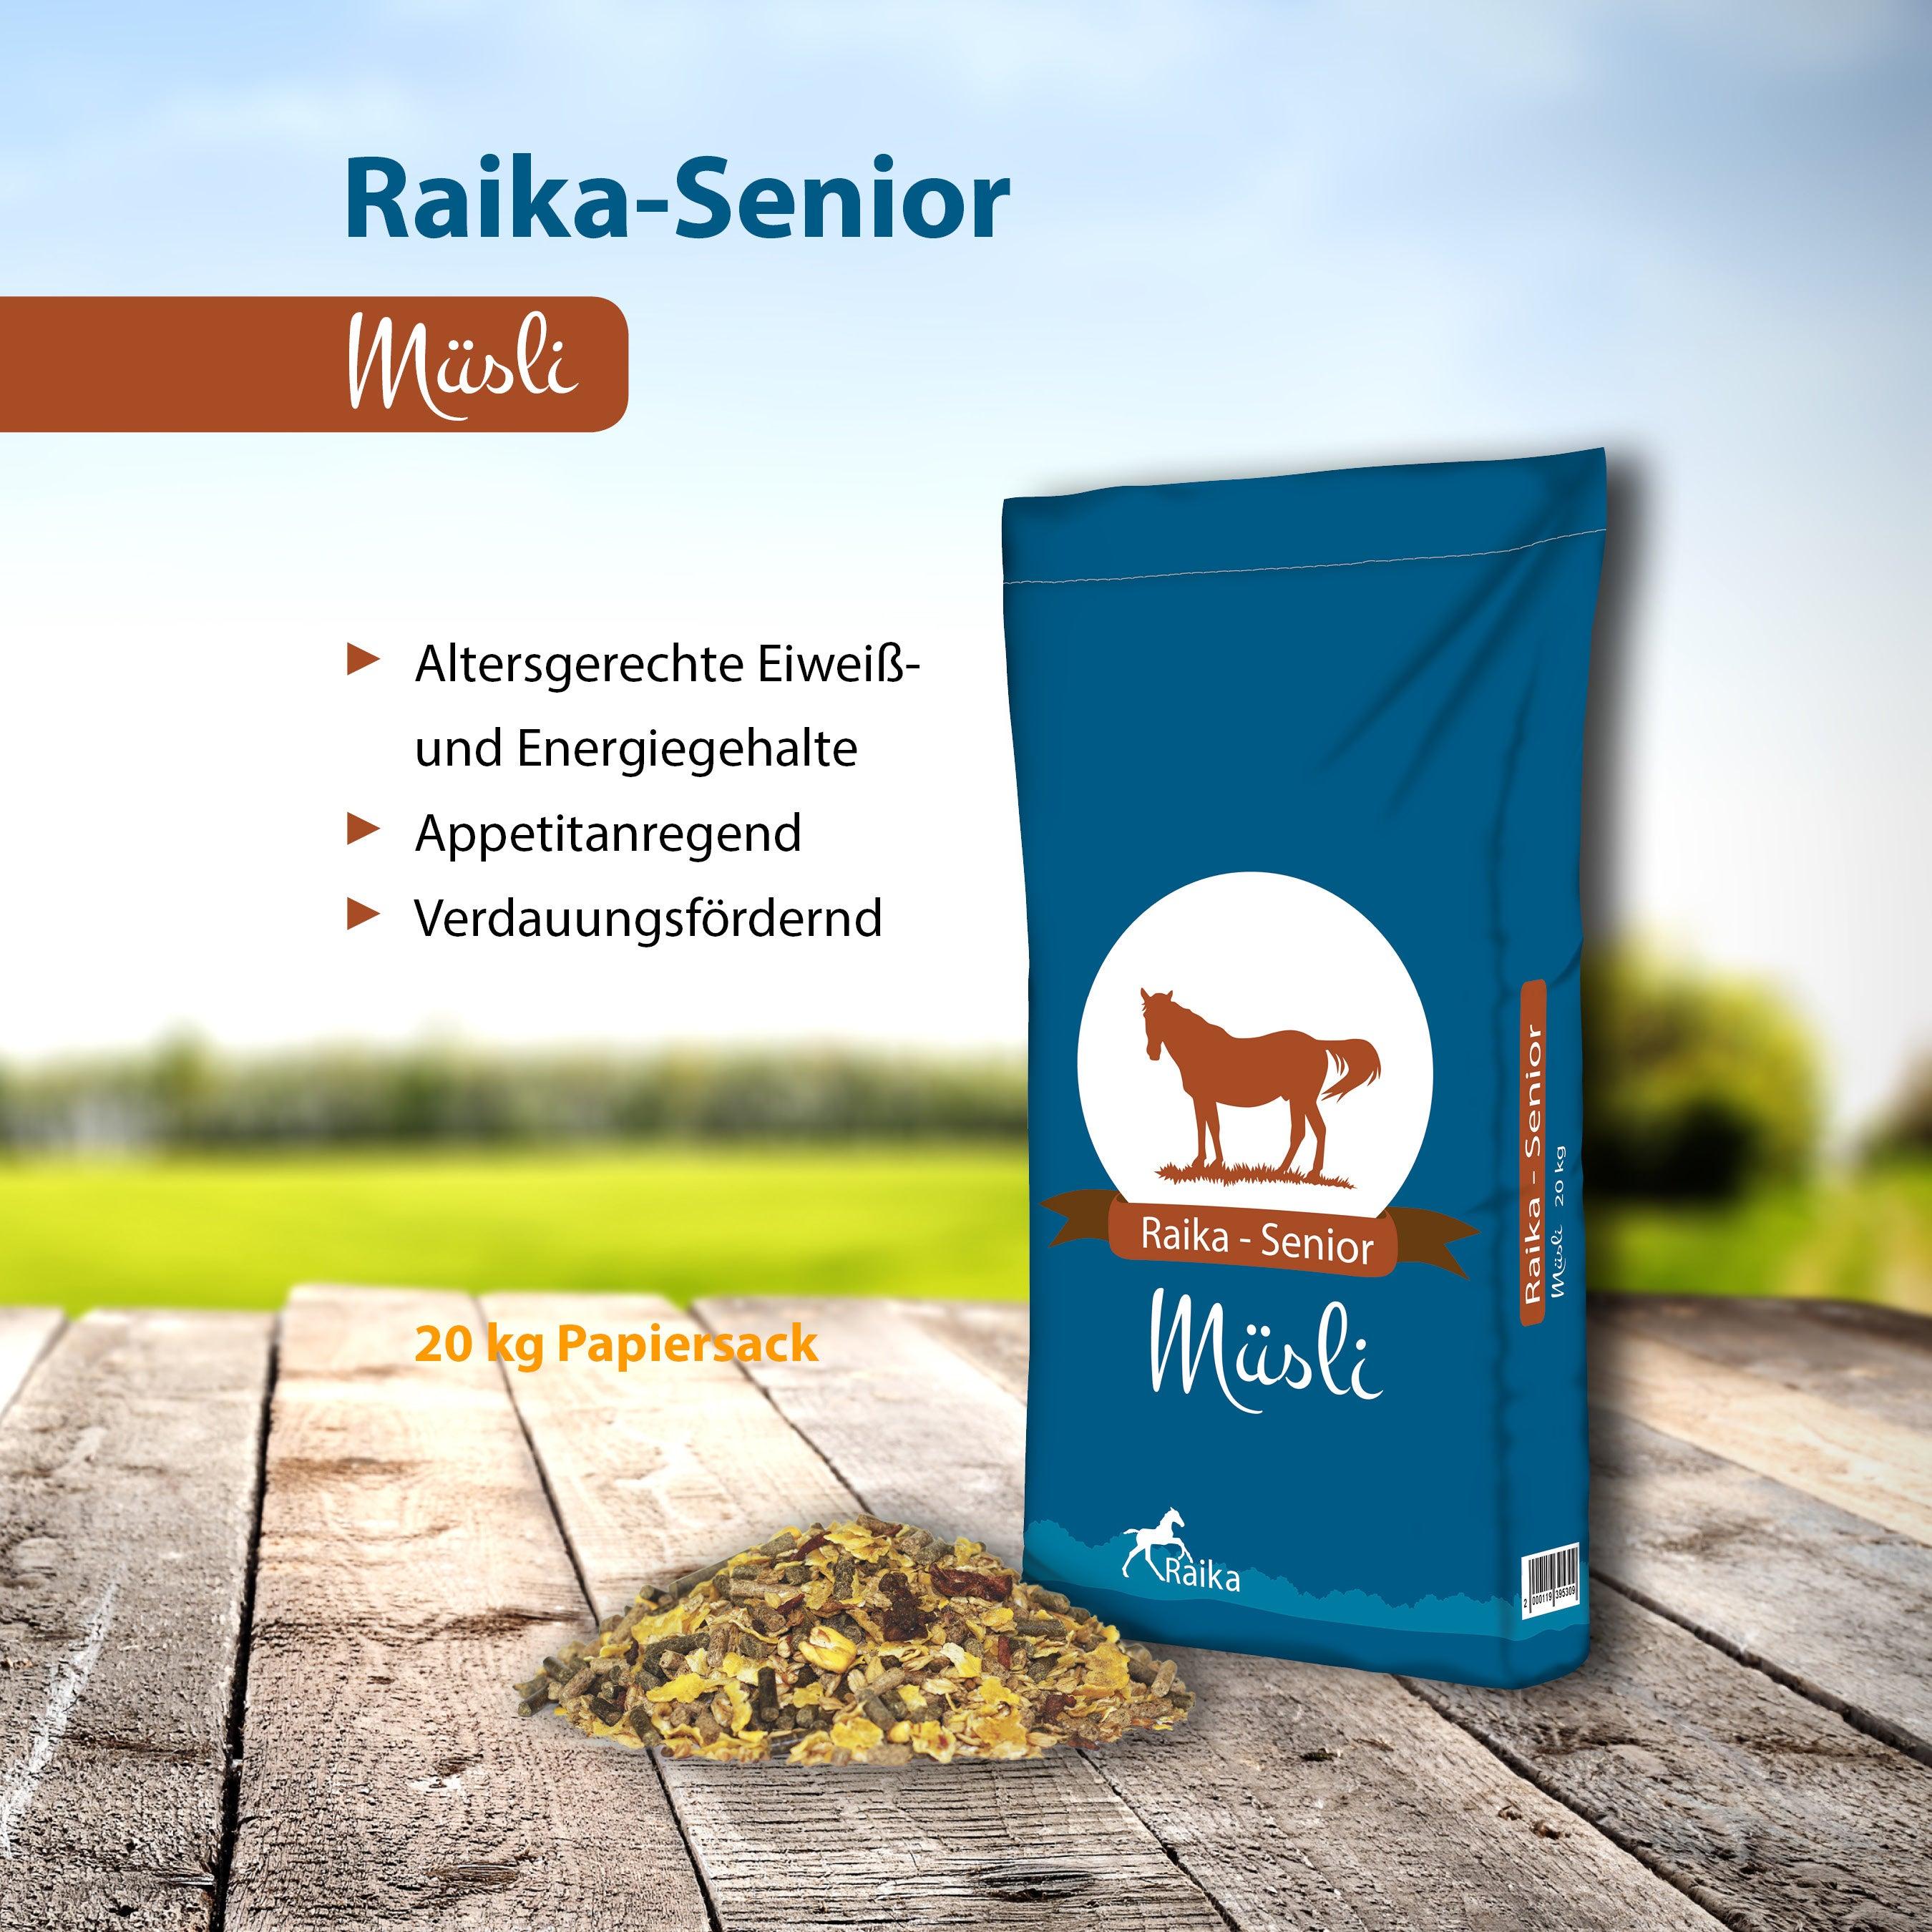 Raika-Senior Müsli Pferdefutter